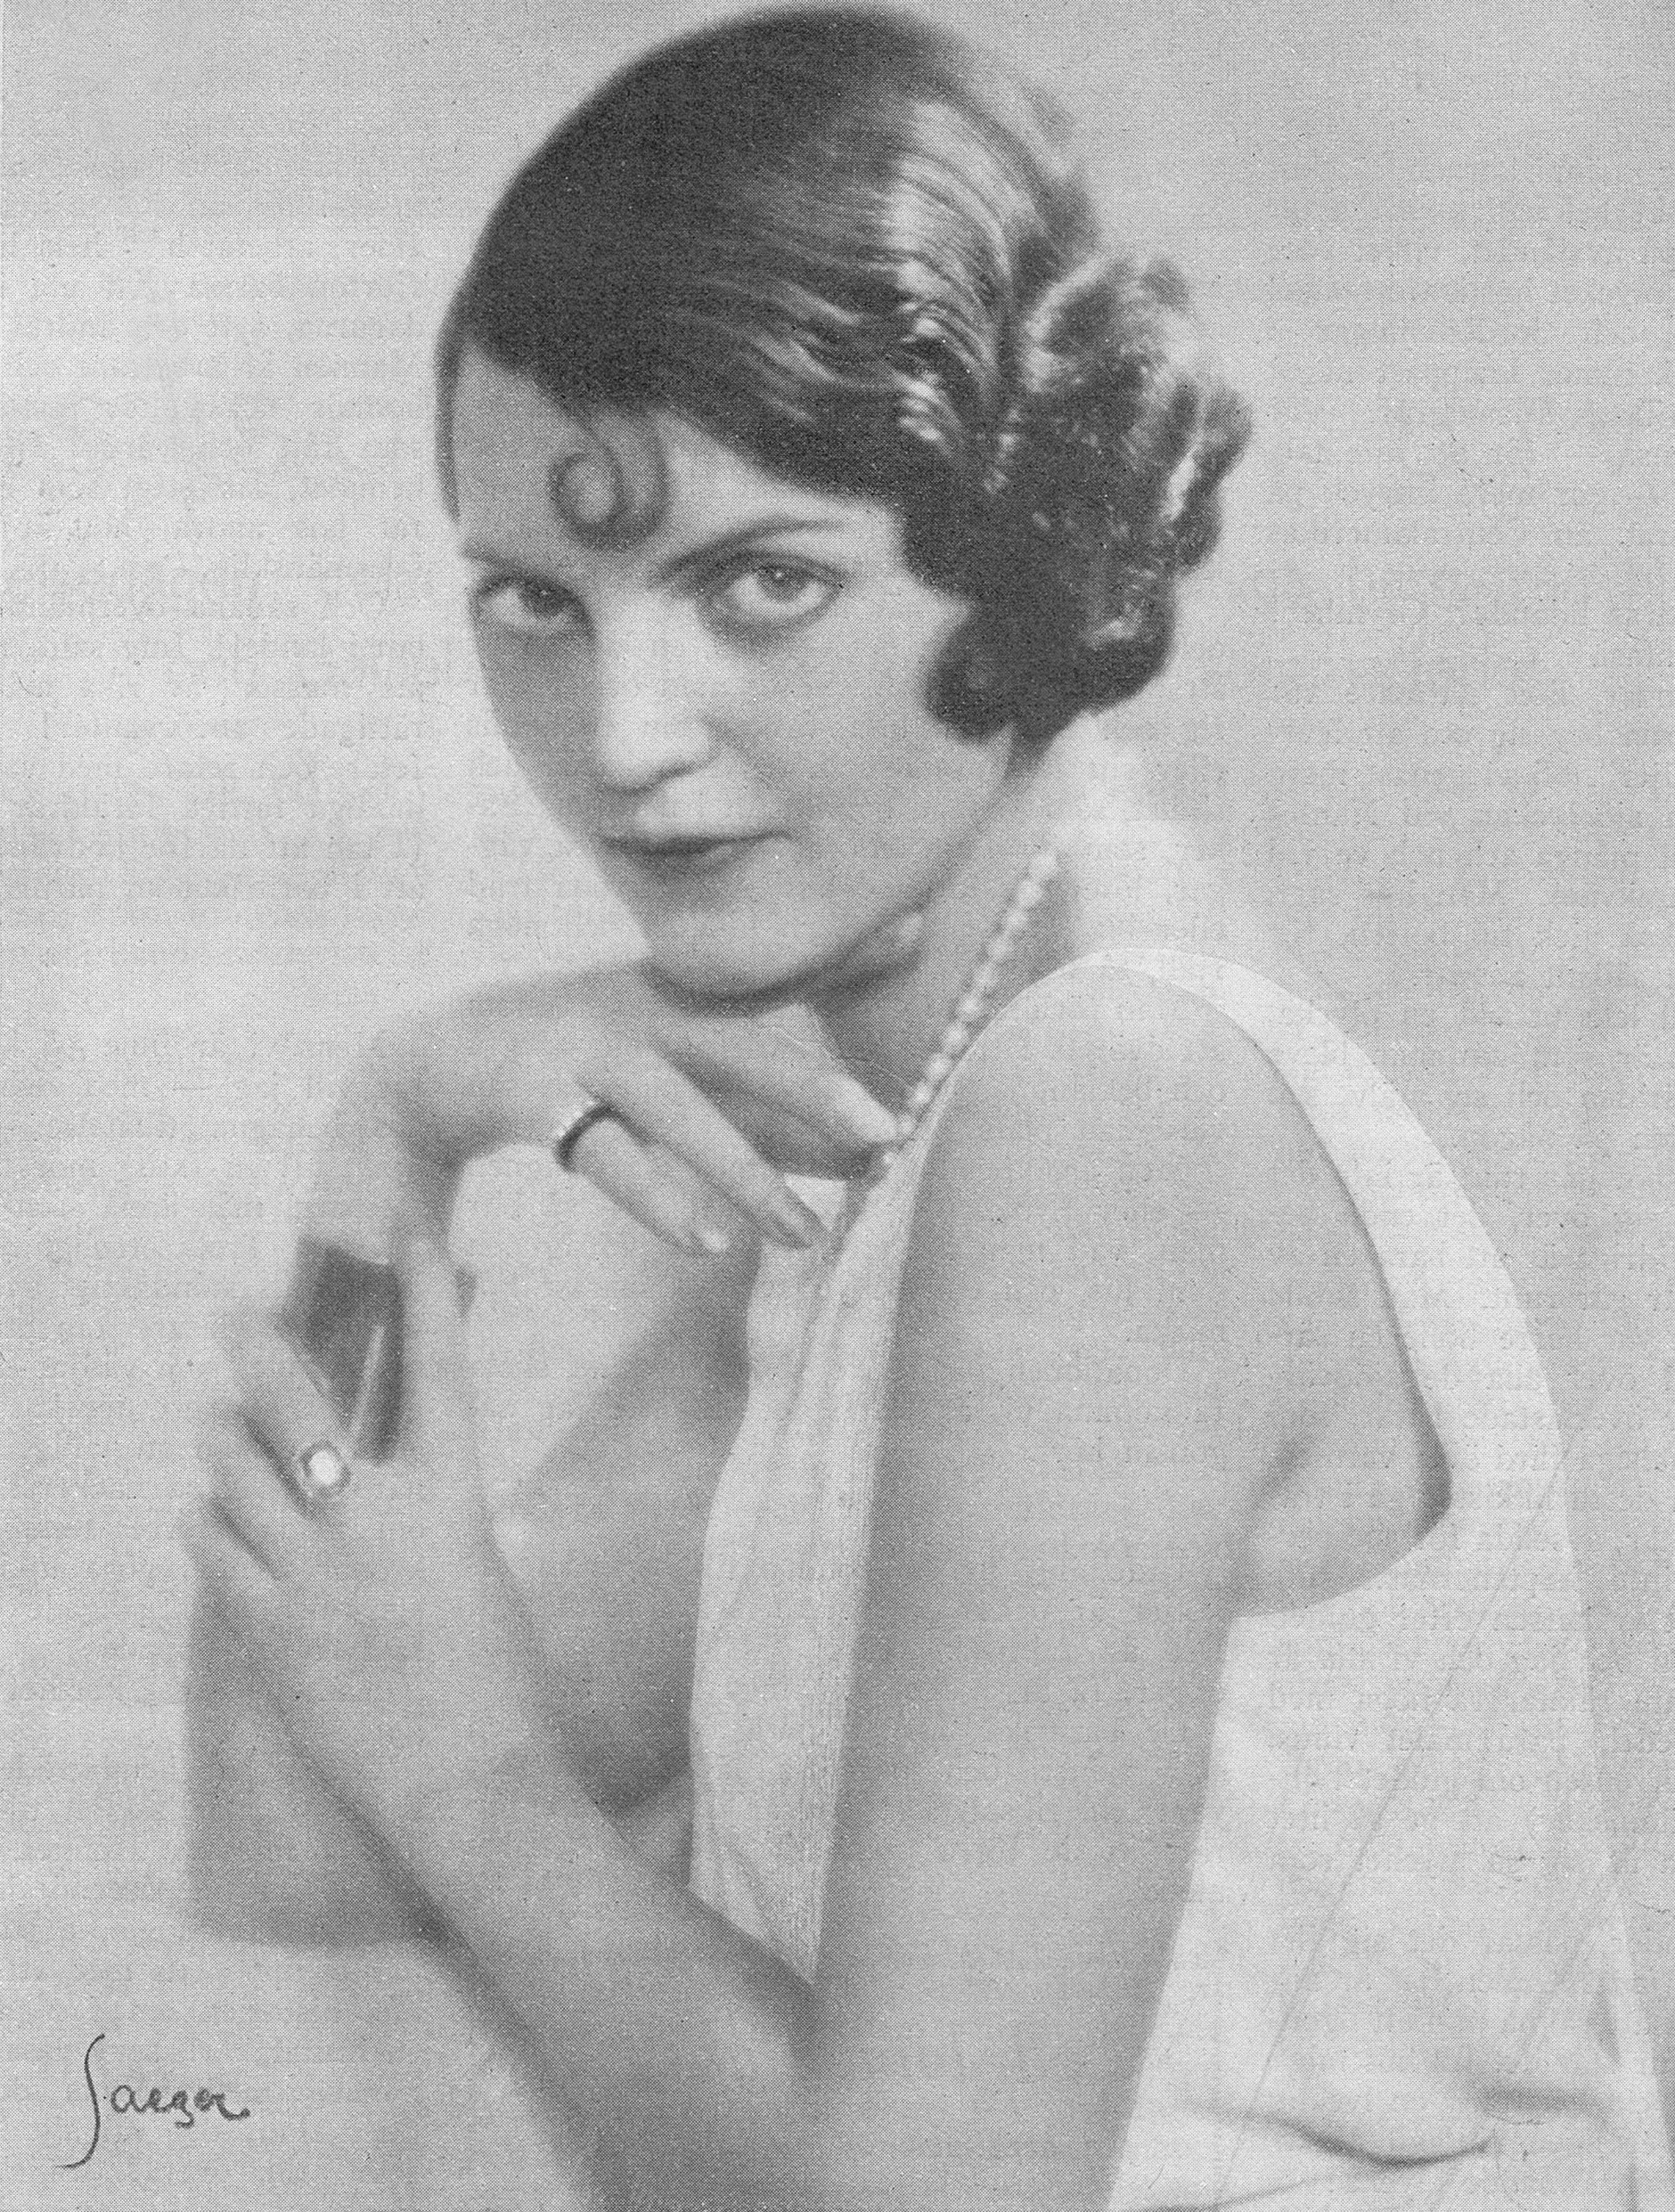 Margit Manstad in Idun magazine, 1931. Photo by Atelier Jaeger, Stockholm. Image source: Svenskt Porträttarkiv (CC-BY-NC-SA 4.0; cropped)